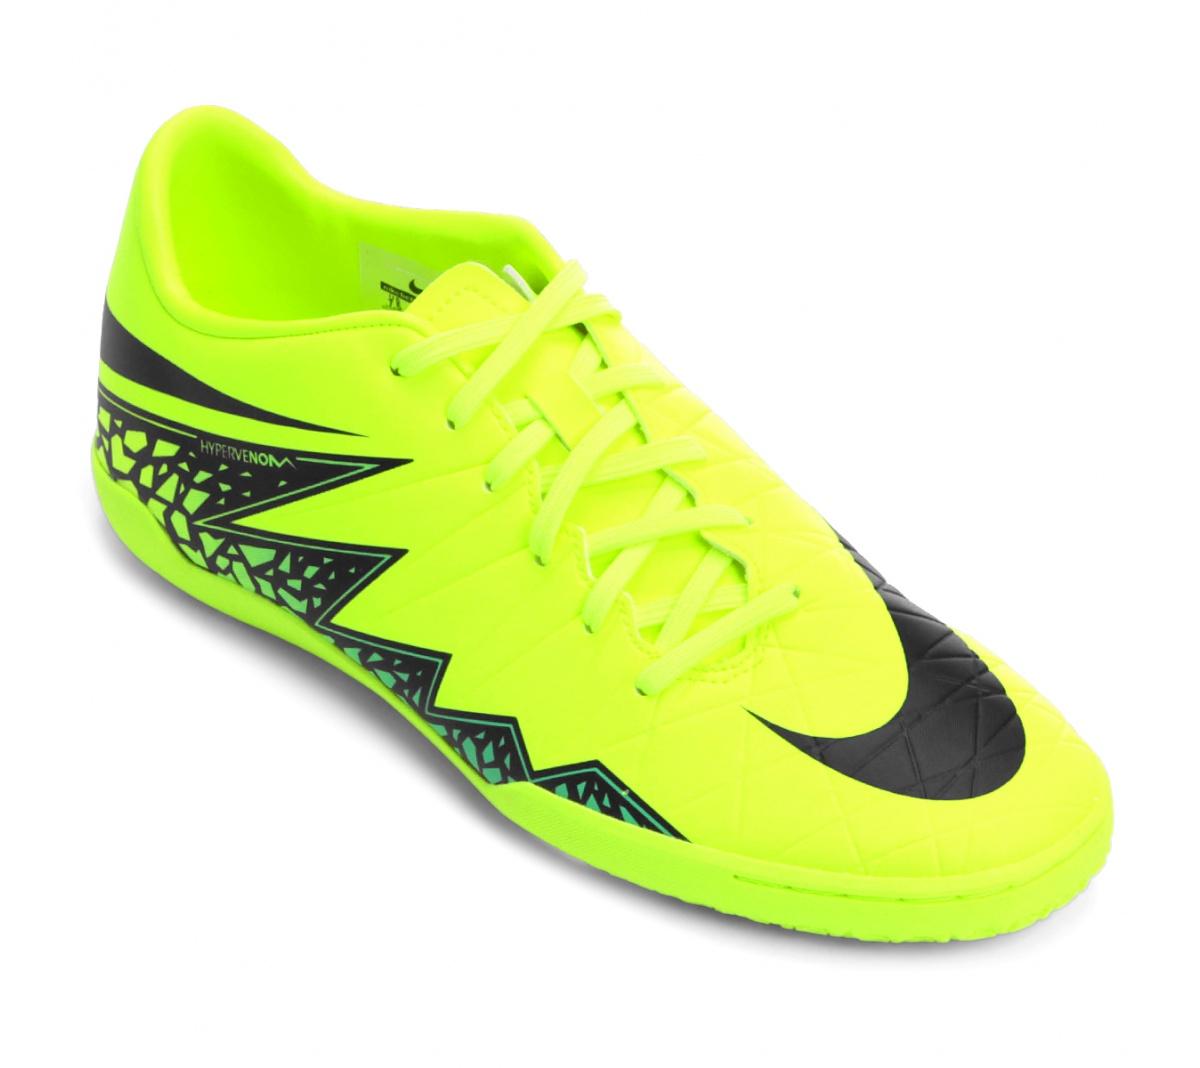 80f582b8a094a Tênis Nike Hypervenom Phelon II Futsal Infantil - Mundo do Futebol